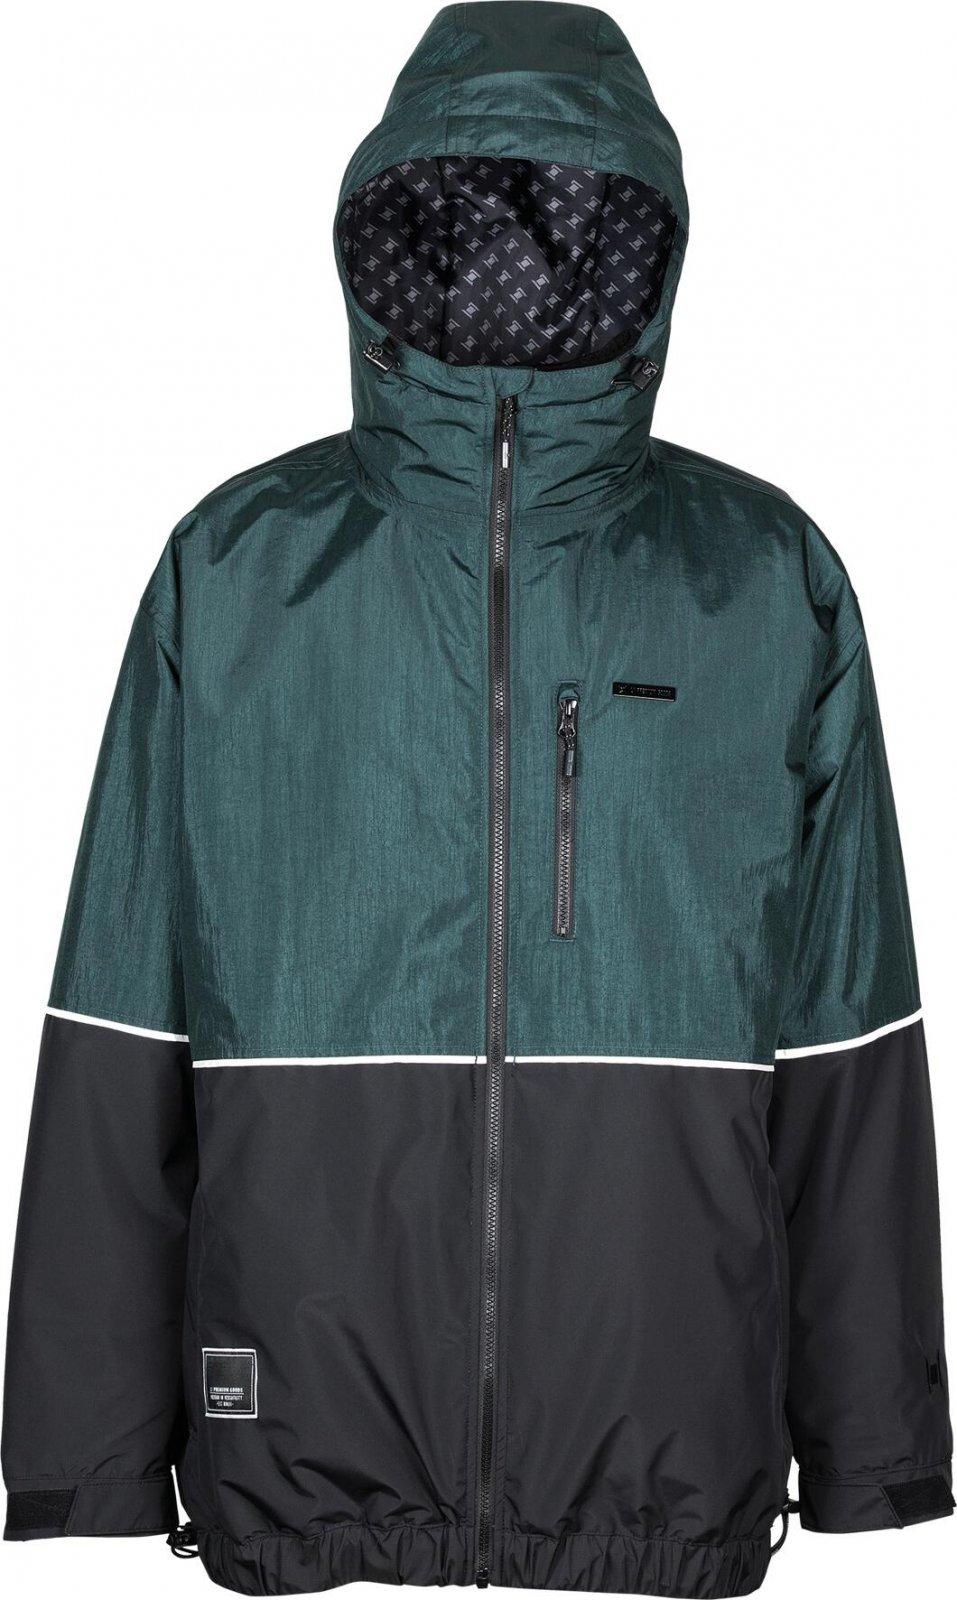 L1 Ventura Jacket (Multiple Color Options)